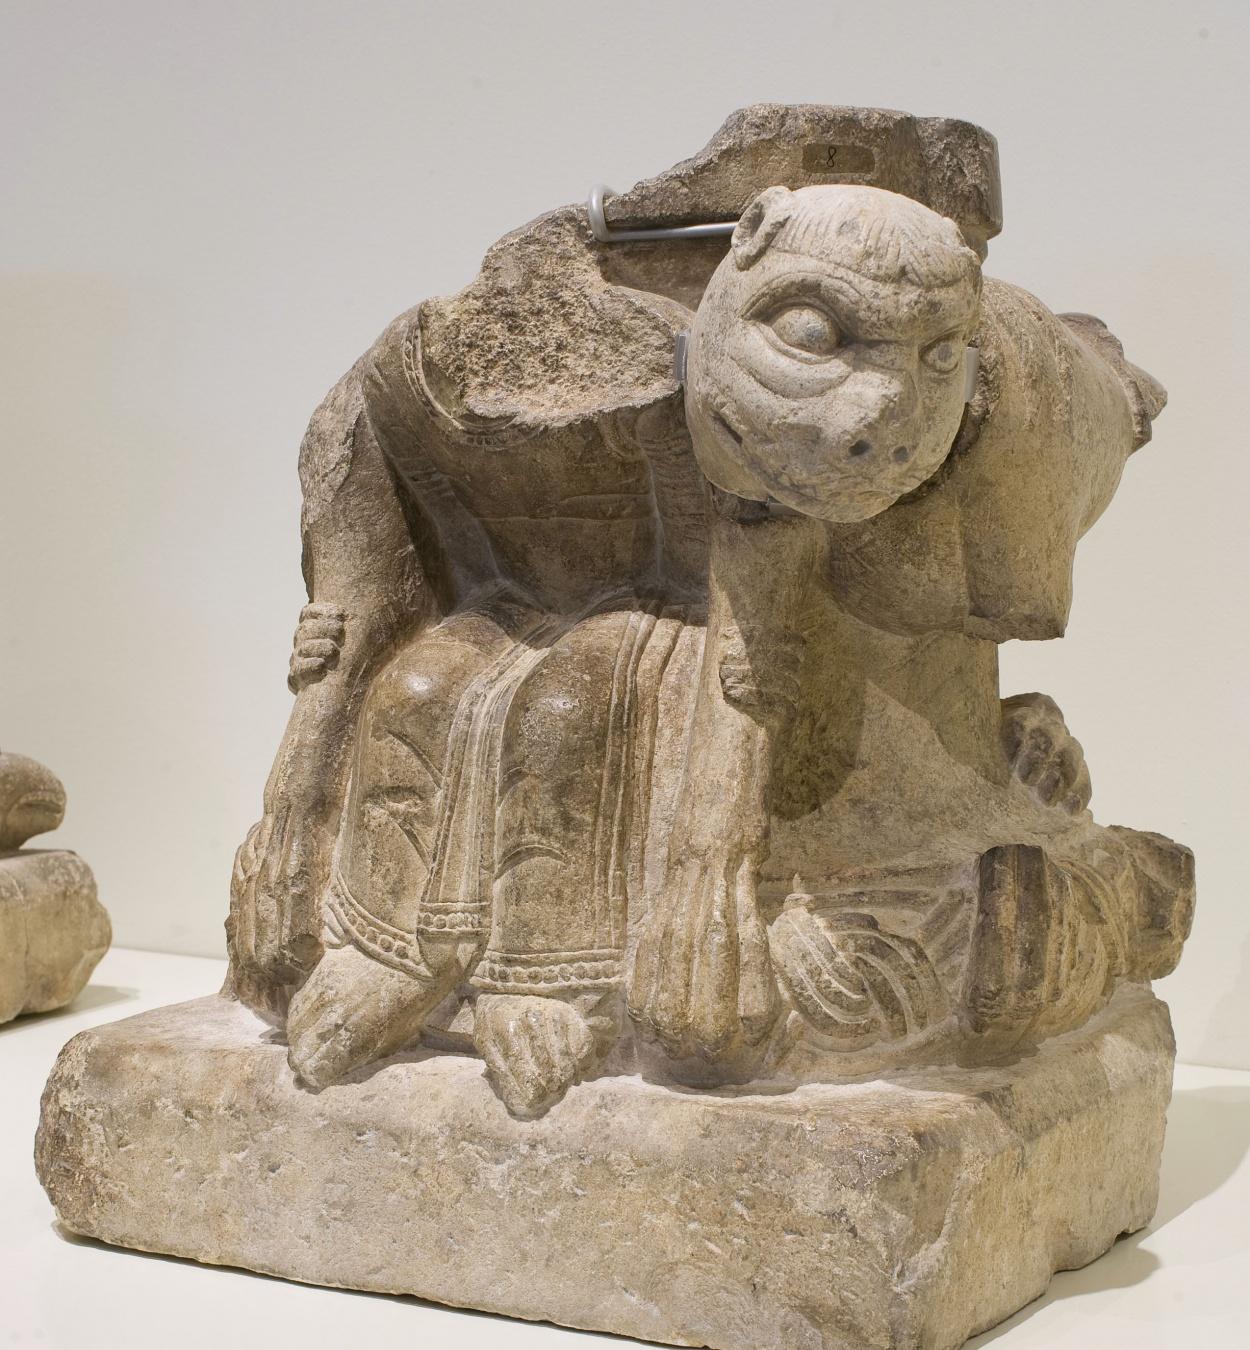 Anònim. Catalunya - Basis of the baldachin of Ripoll - Second third of 12th century [2]